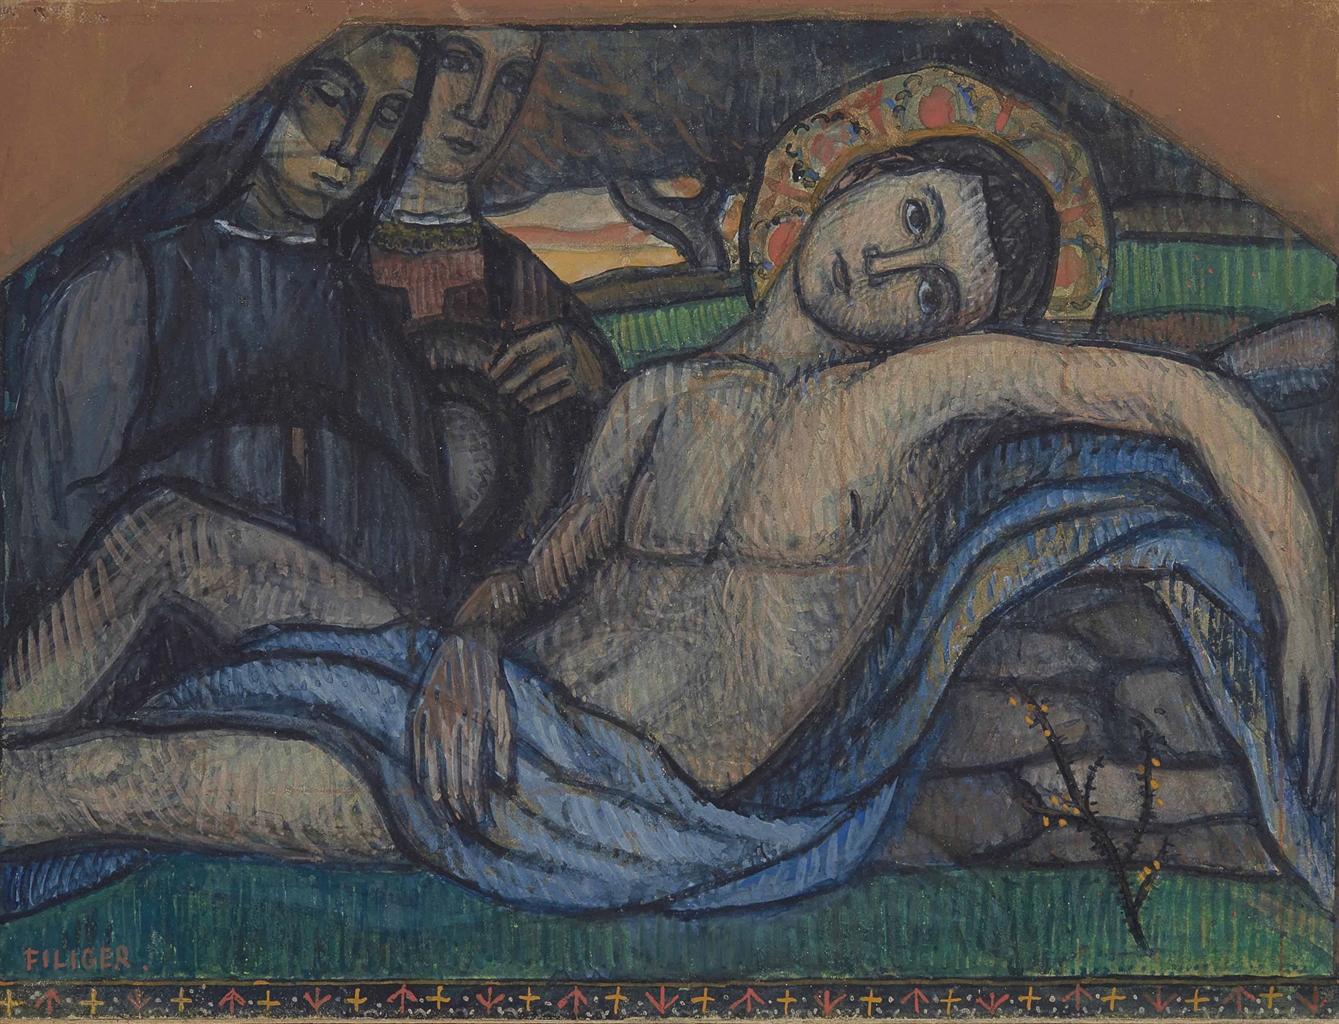 Charles Filiger-Deploration sur le corps du Christ-1895